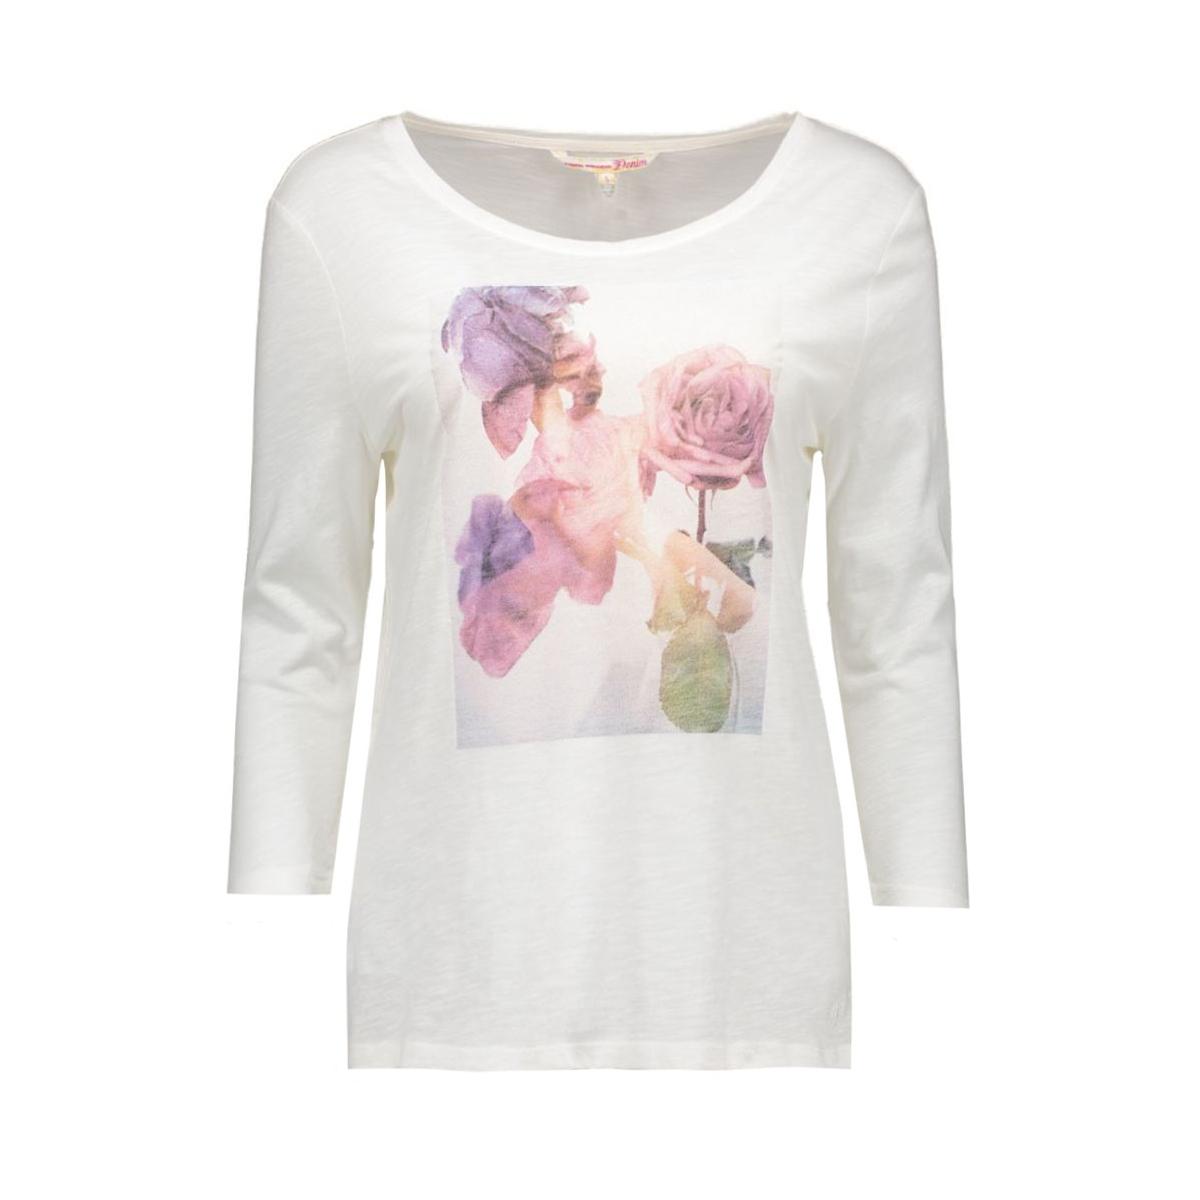 1036668.00.71 tom tailor t-shirt 8005